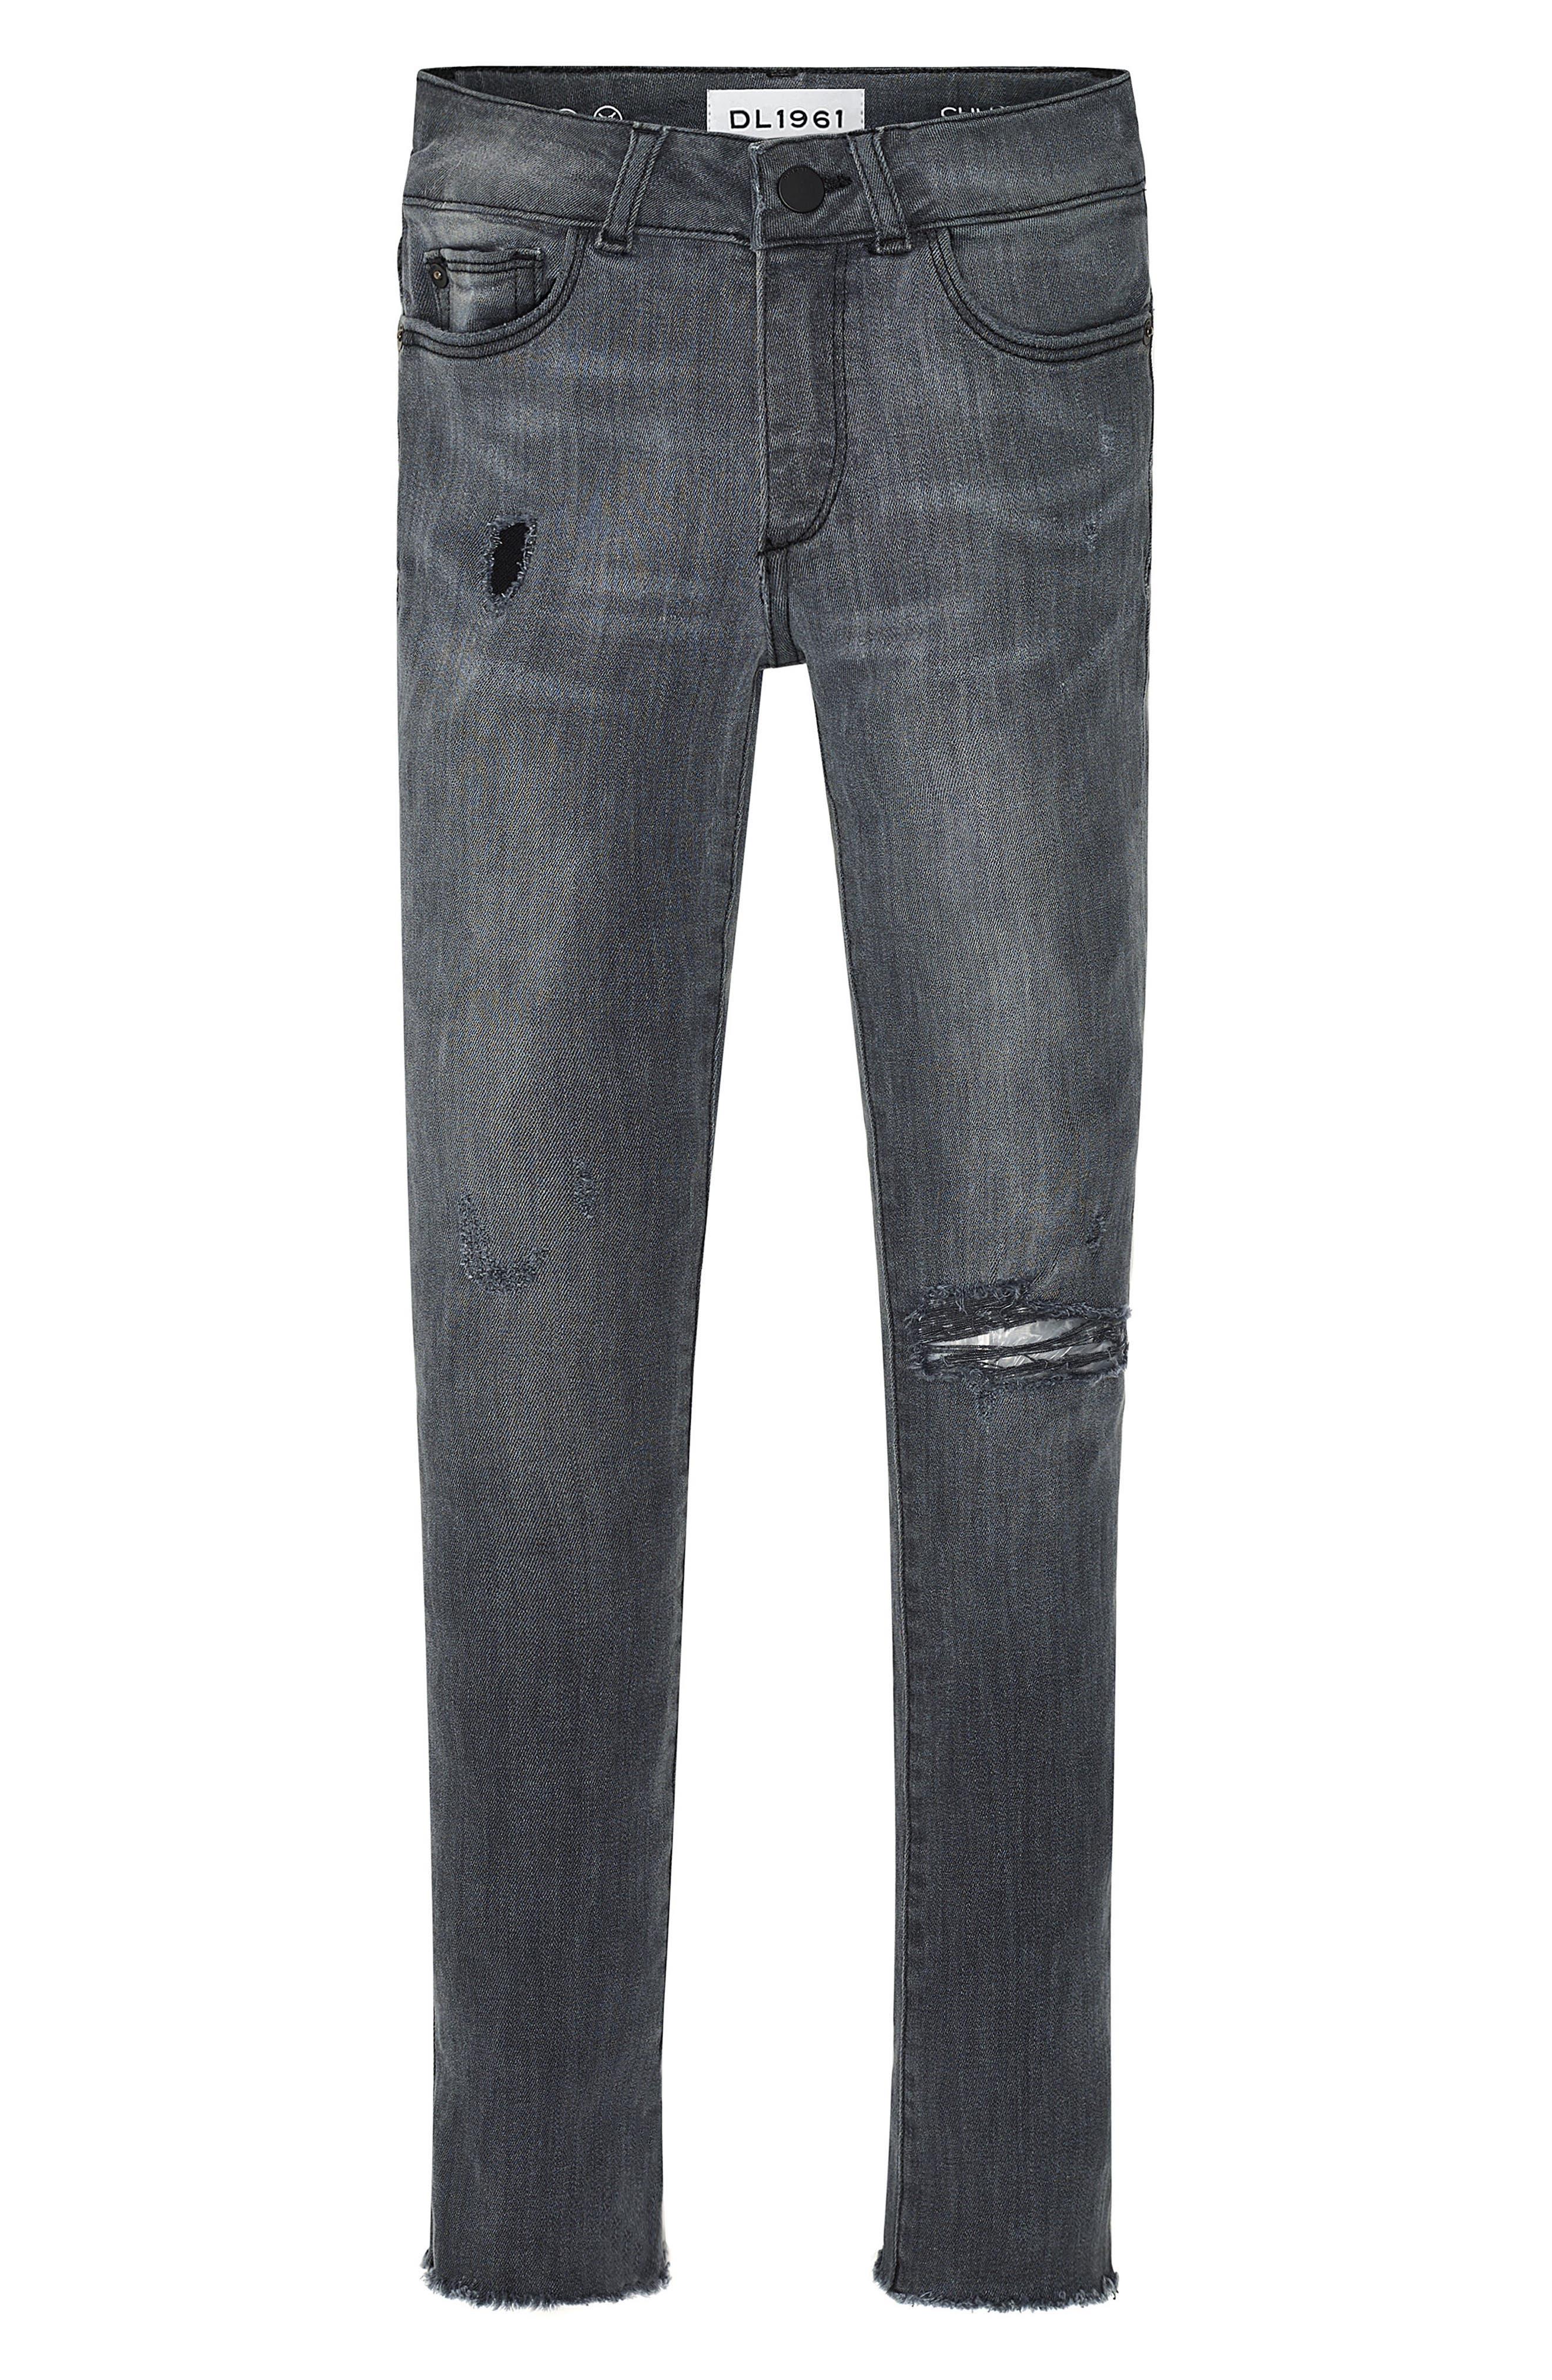 Chloe Raw Hem Skinny Jeans,                             Main thumbnail 1, color,                             025